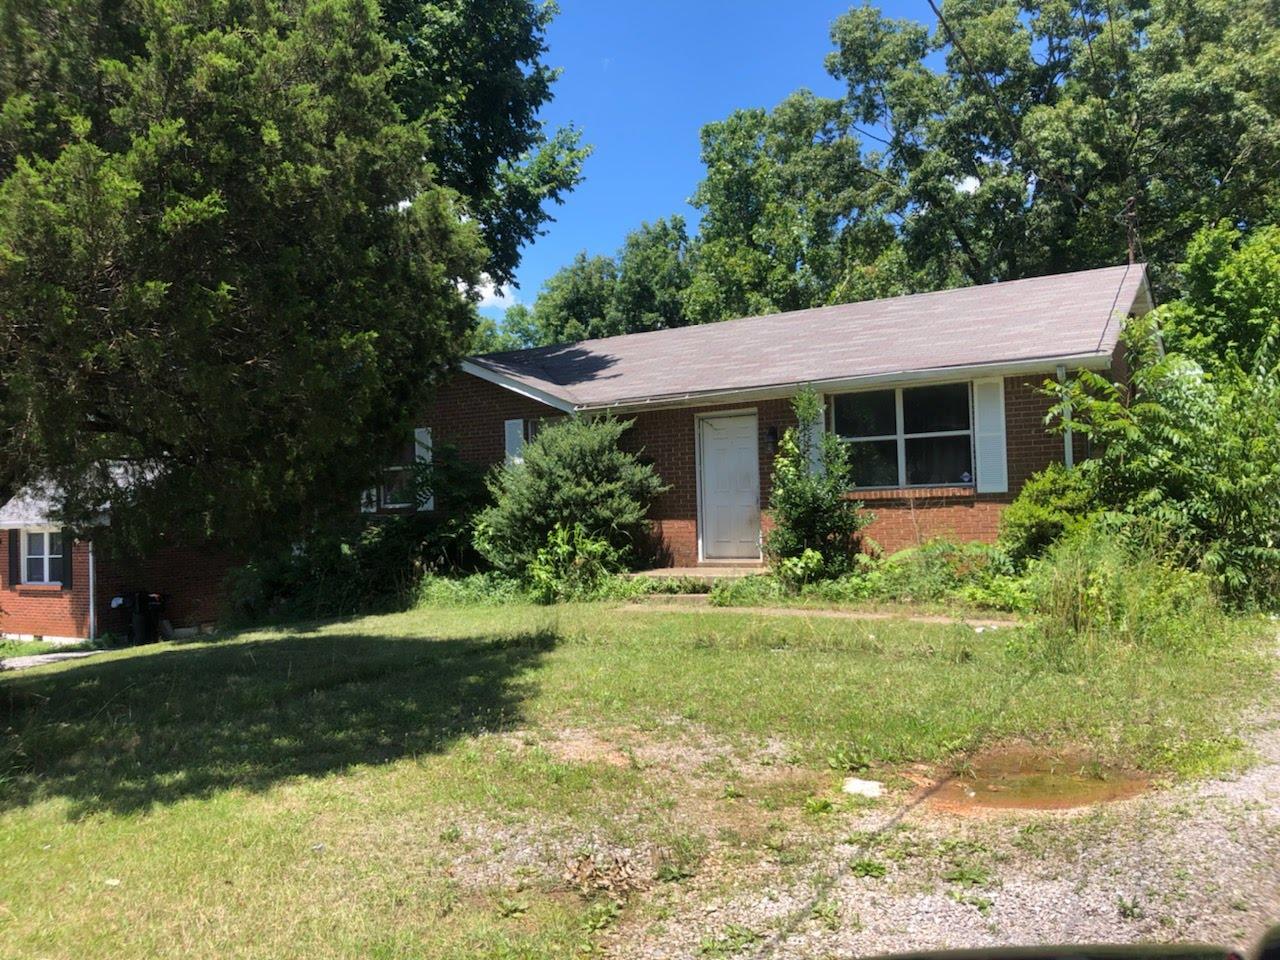 635 Lafayette Rd, Clarksville, TN 37042 - Clarksville, TN real estate listing